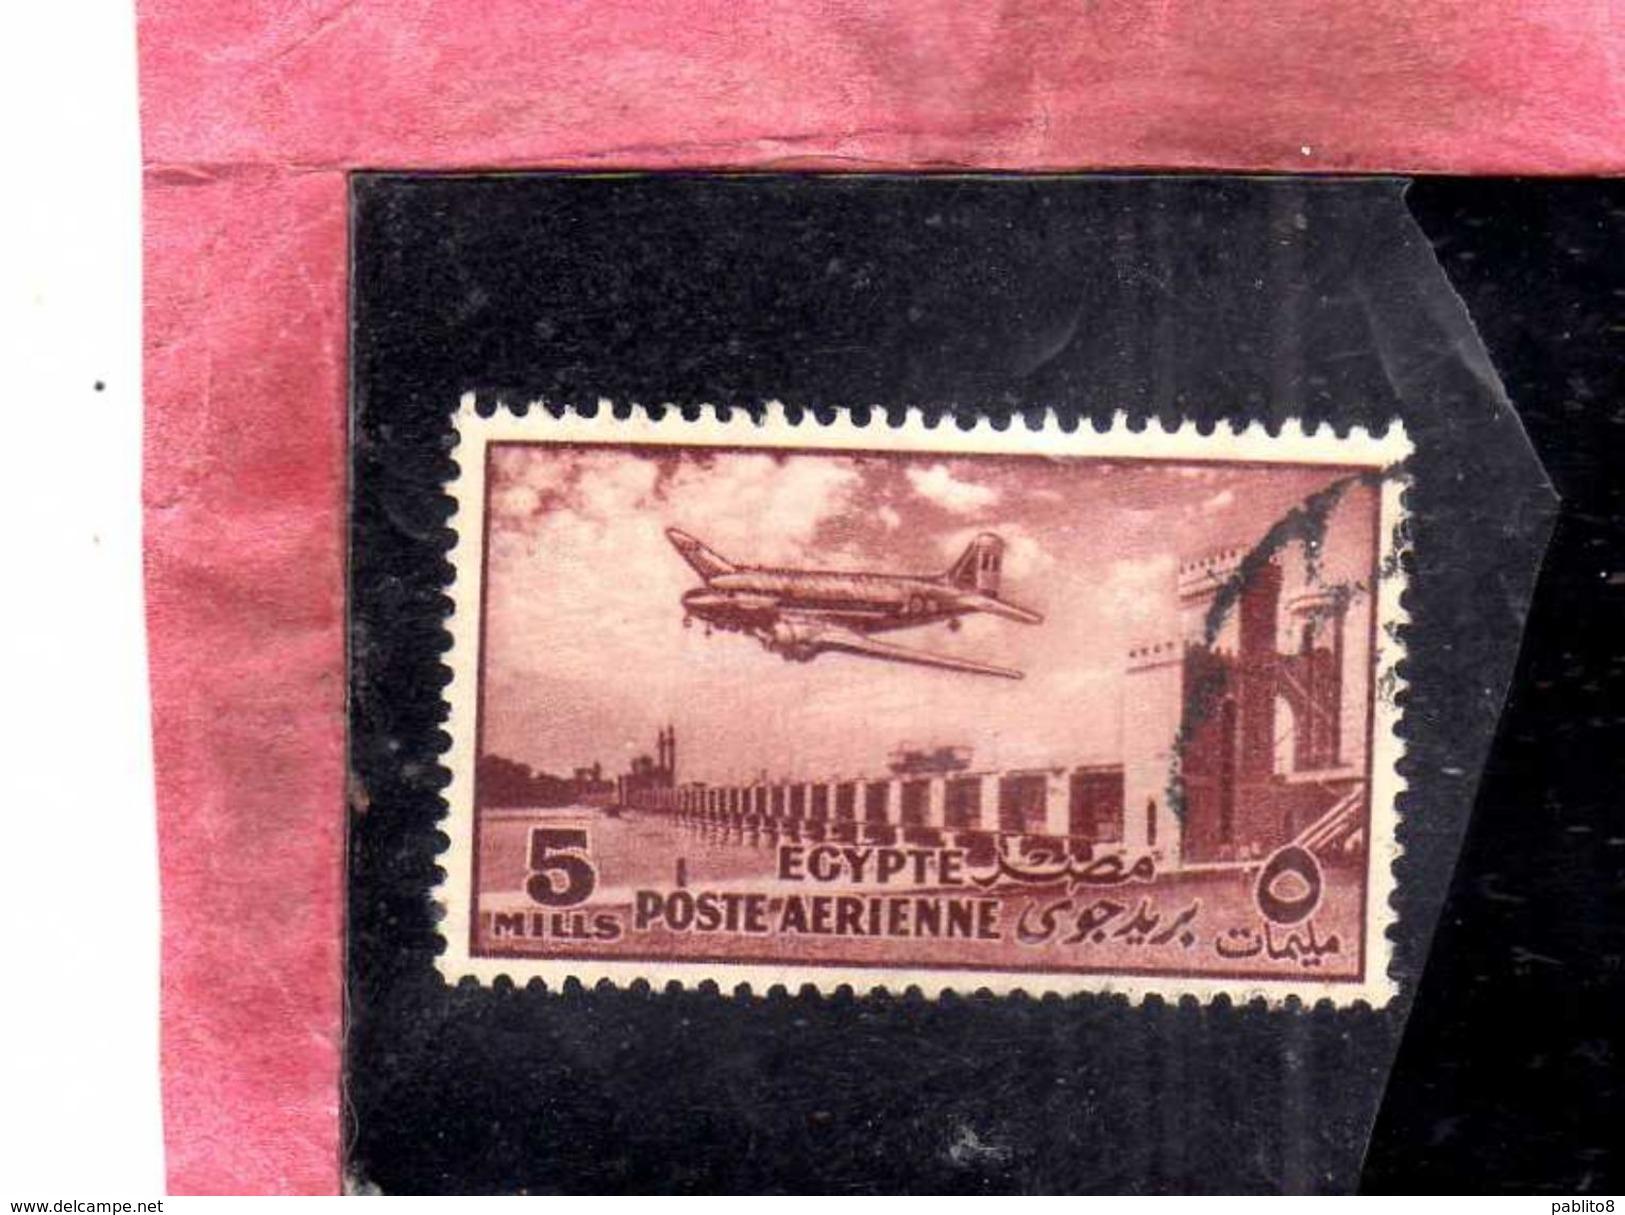 EGYPT EGITTO 1953 AIR MAIL POSTA AEREA DELTA DAM DOUGLAS DC-3 PLANE 5m USATO USED OBLITERE' - Posta Aerea